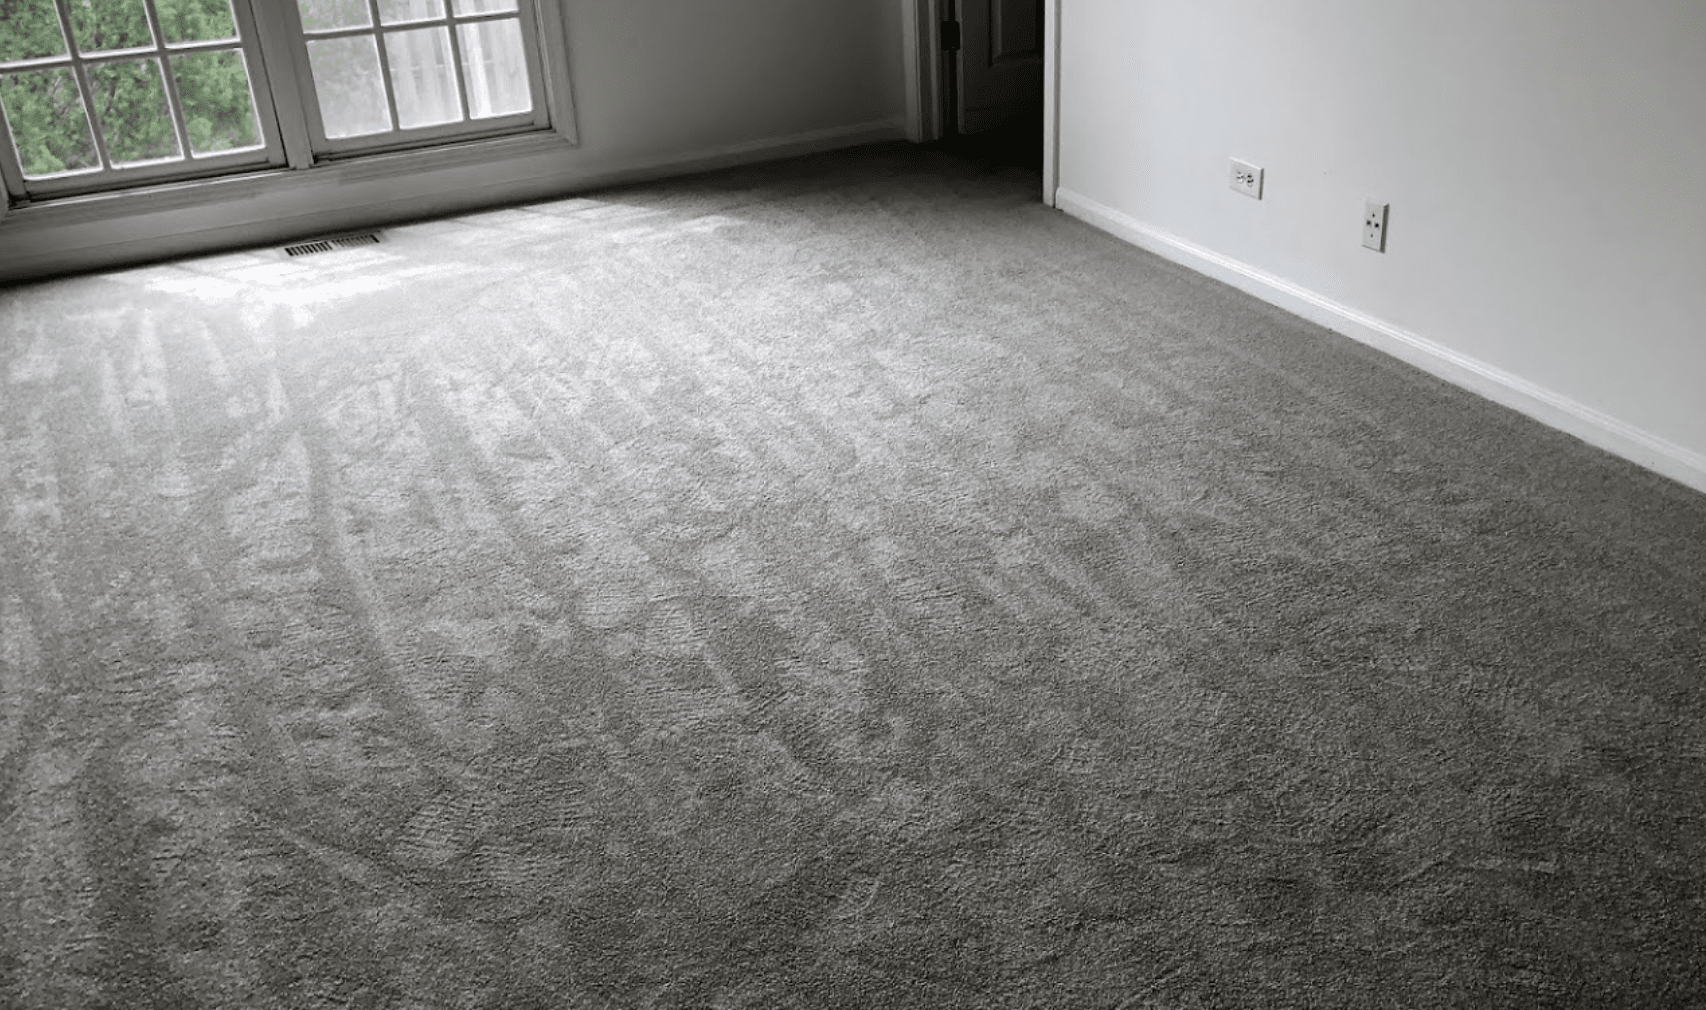 New carpet flooring in Barrington, IL from Alpha Carpet & Flooring